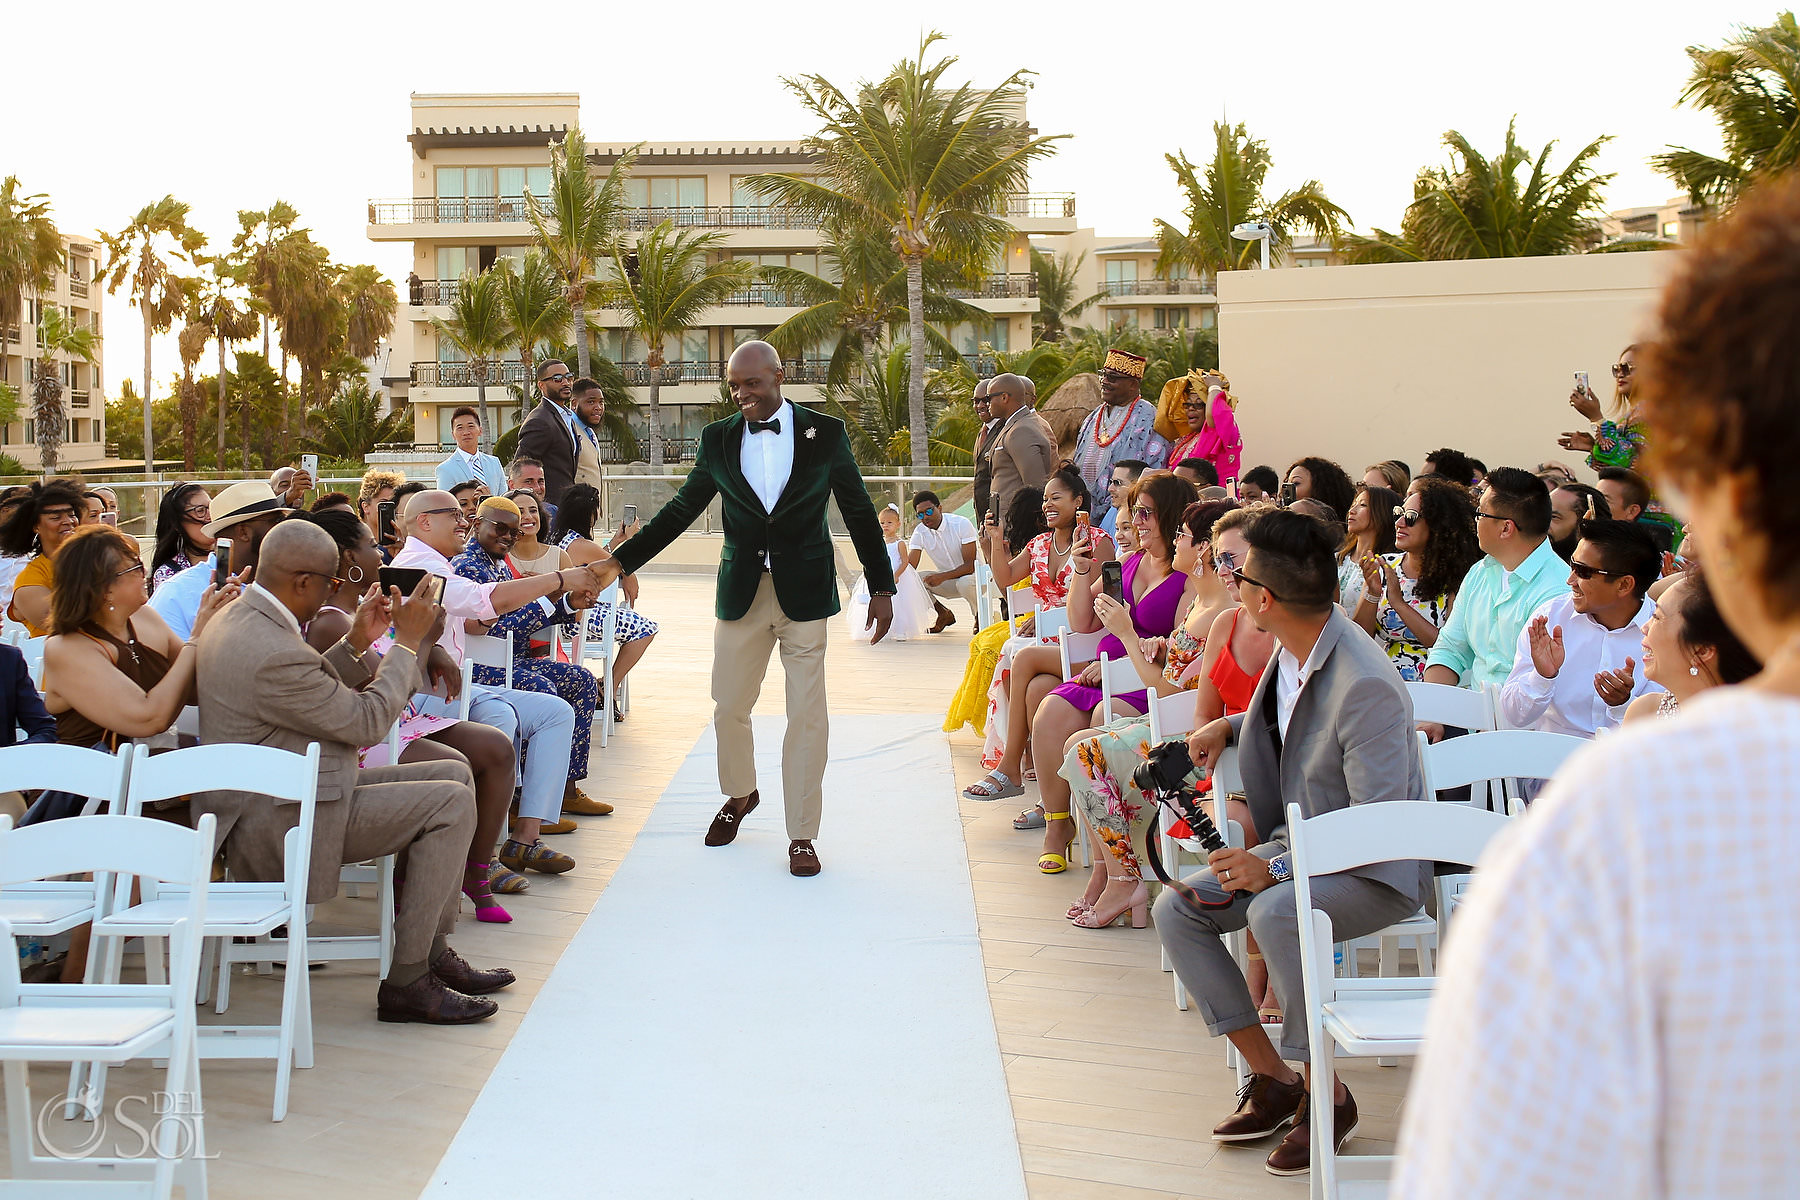 Best groom wedding entrance ideas high five Dreams Riviera Cancun terrace Mexico